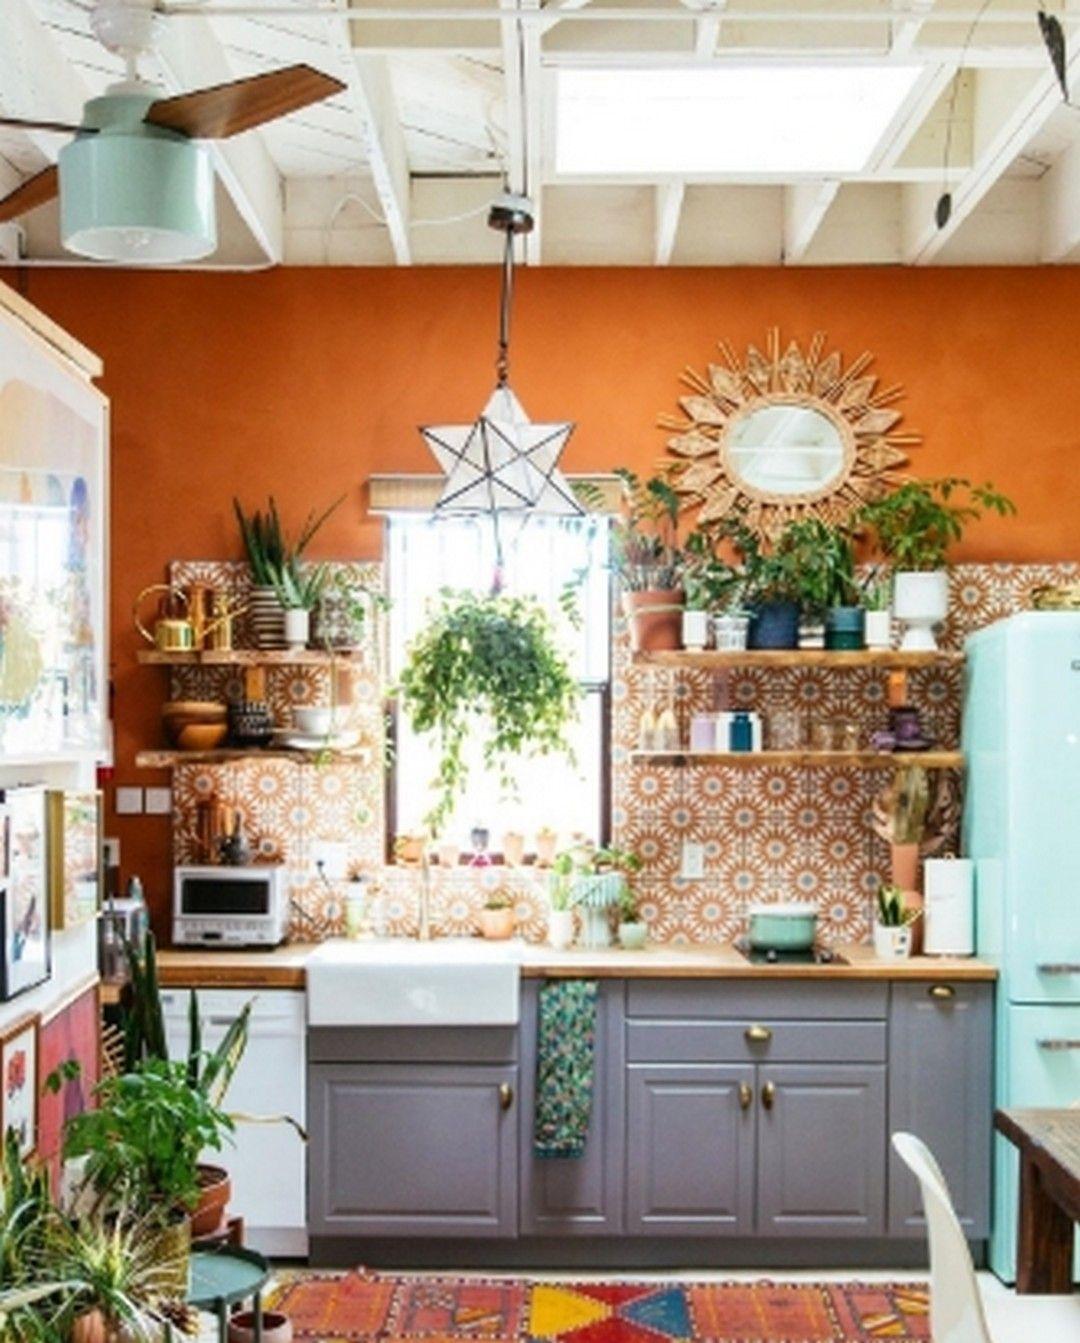 8 Unique And Colorful Bohemian Kitchen Design Ideas ...